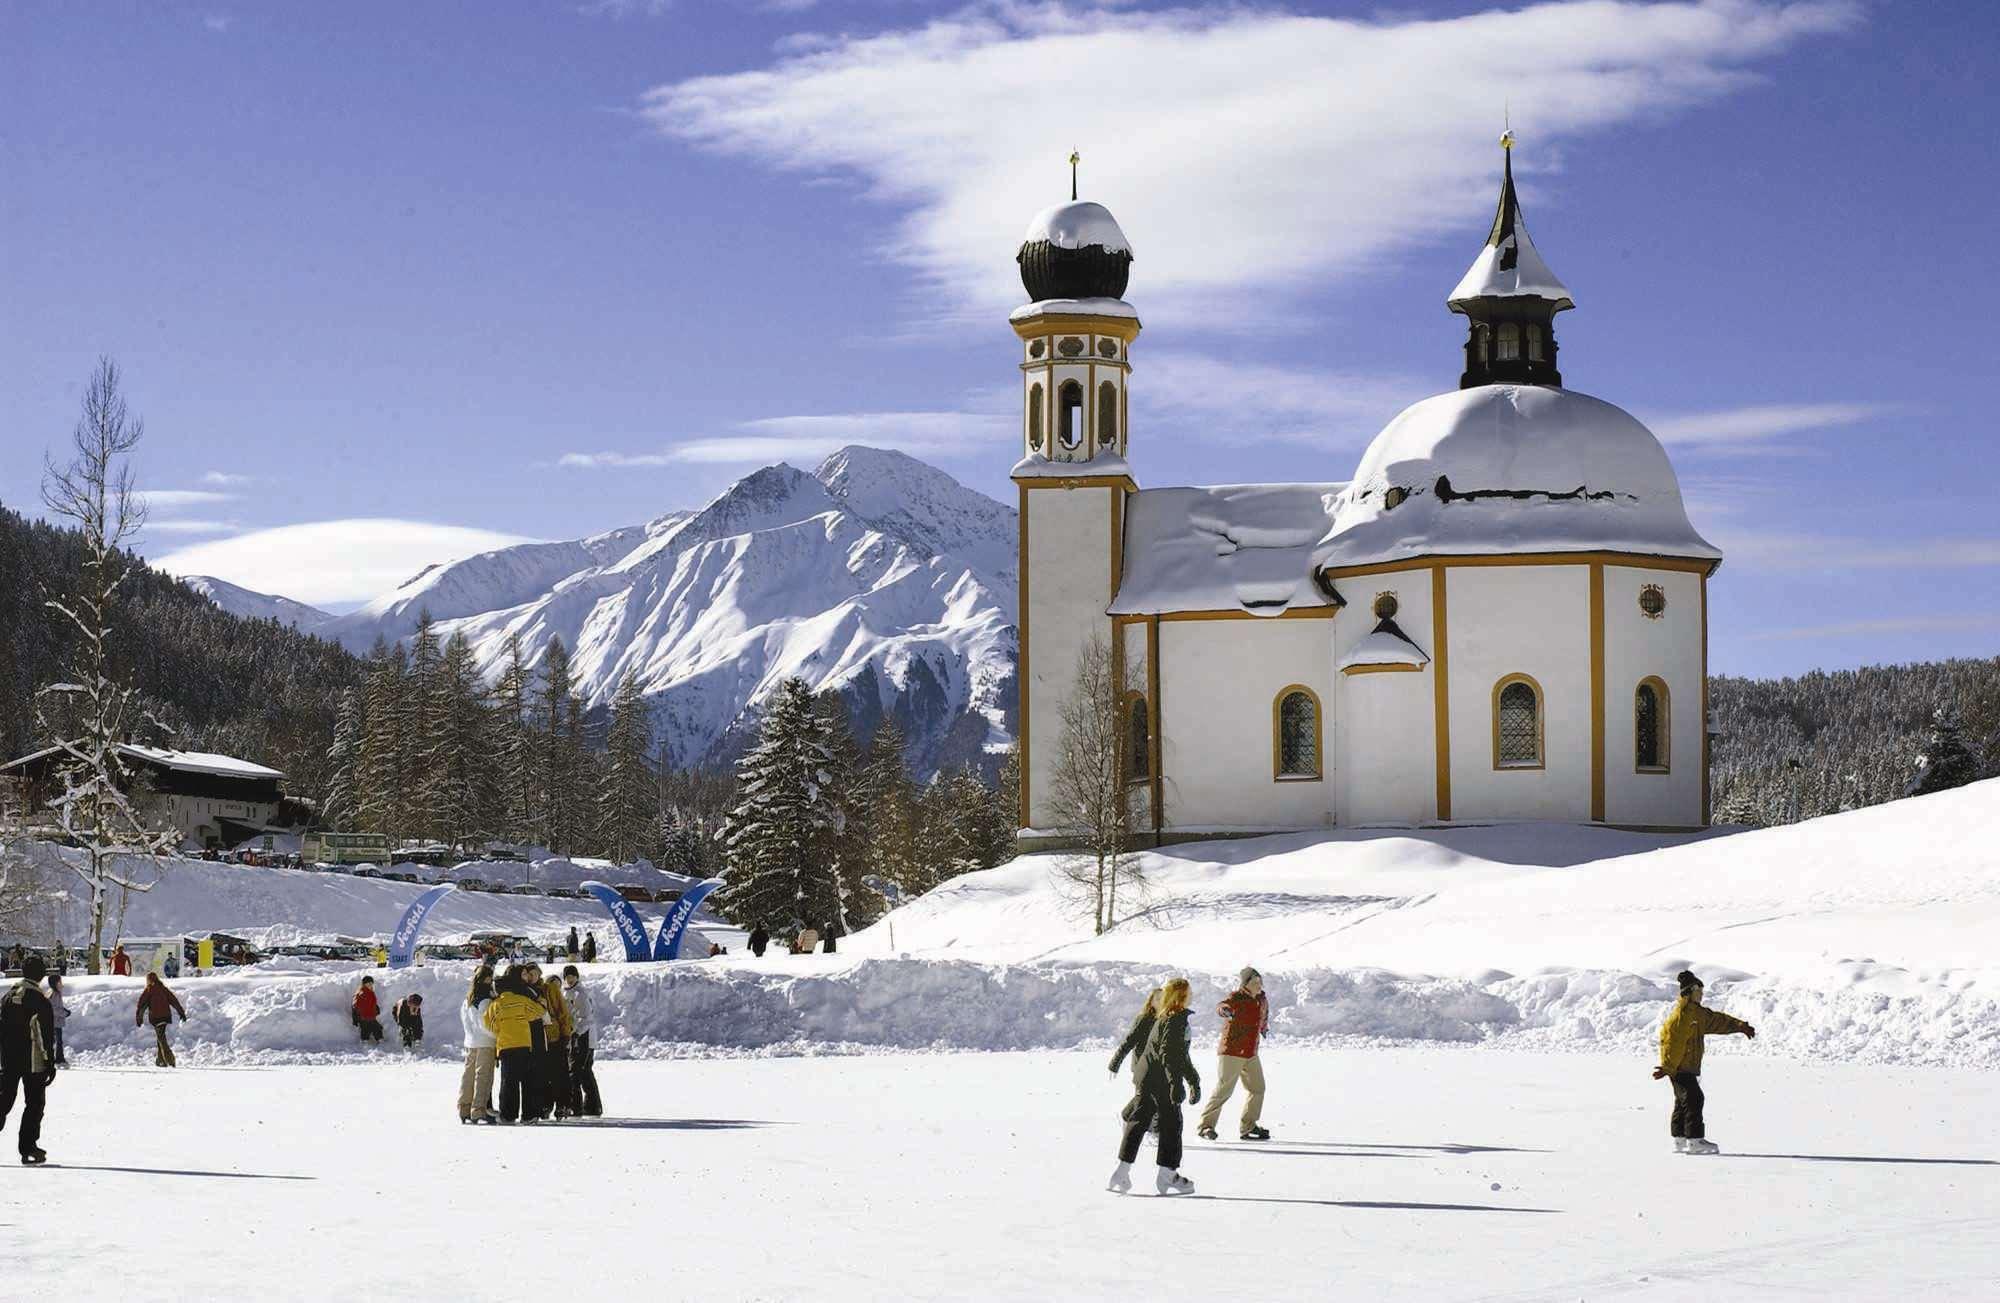 Seefeld Austria  city photos : Seefeld Skiing holidays | Ski holiday Seefeld | Austria | Igluski.com